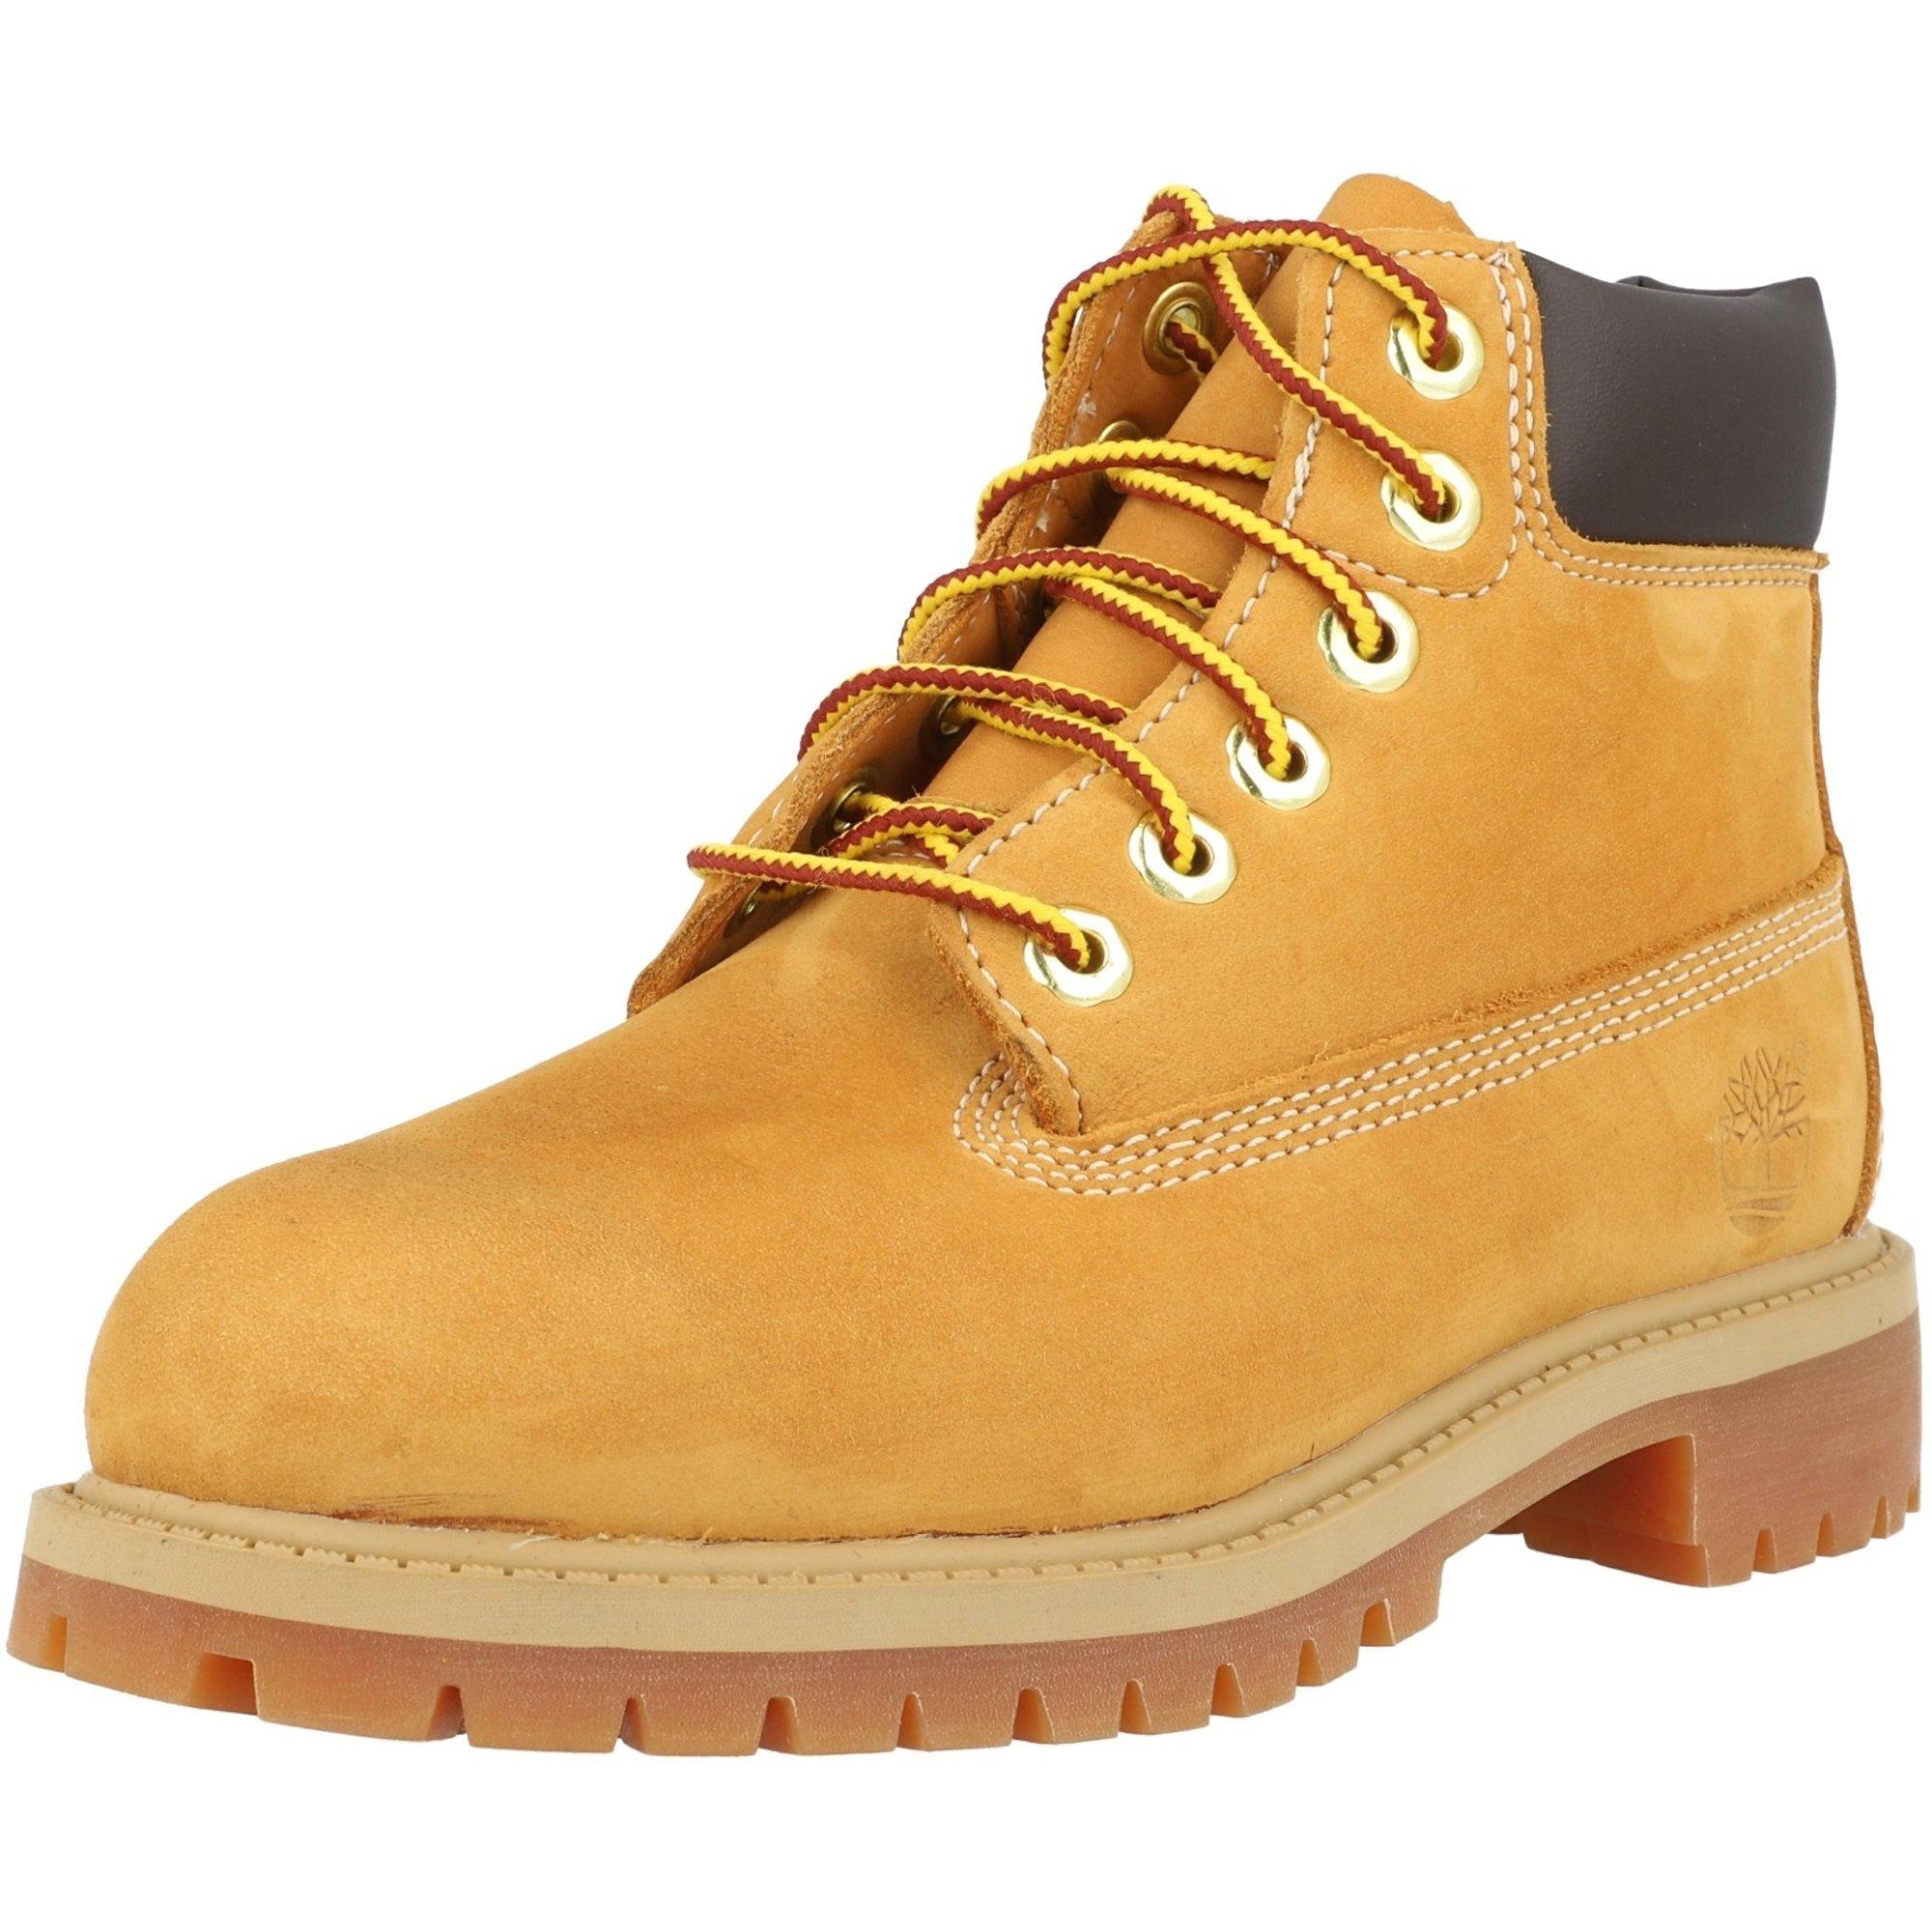 6 Inch Classic Boot Y Wheat Nubuck